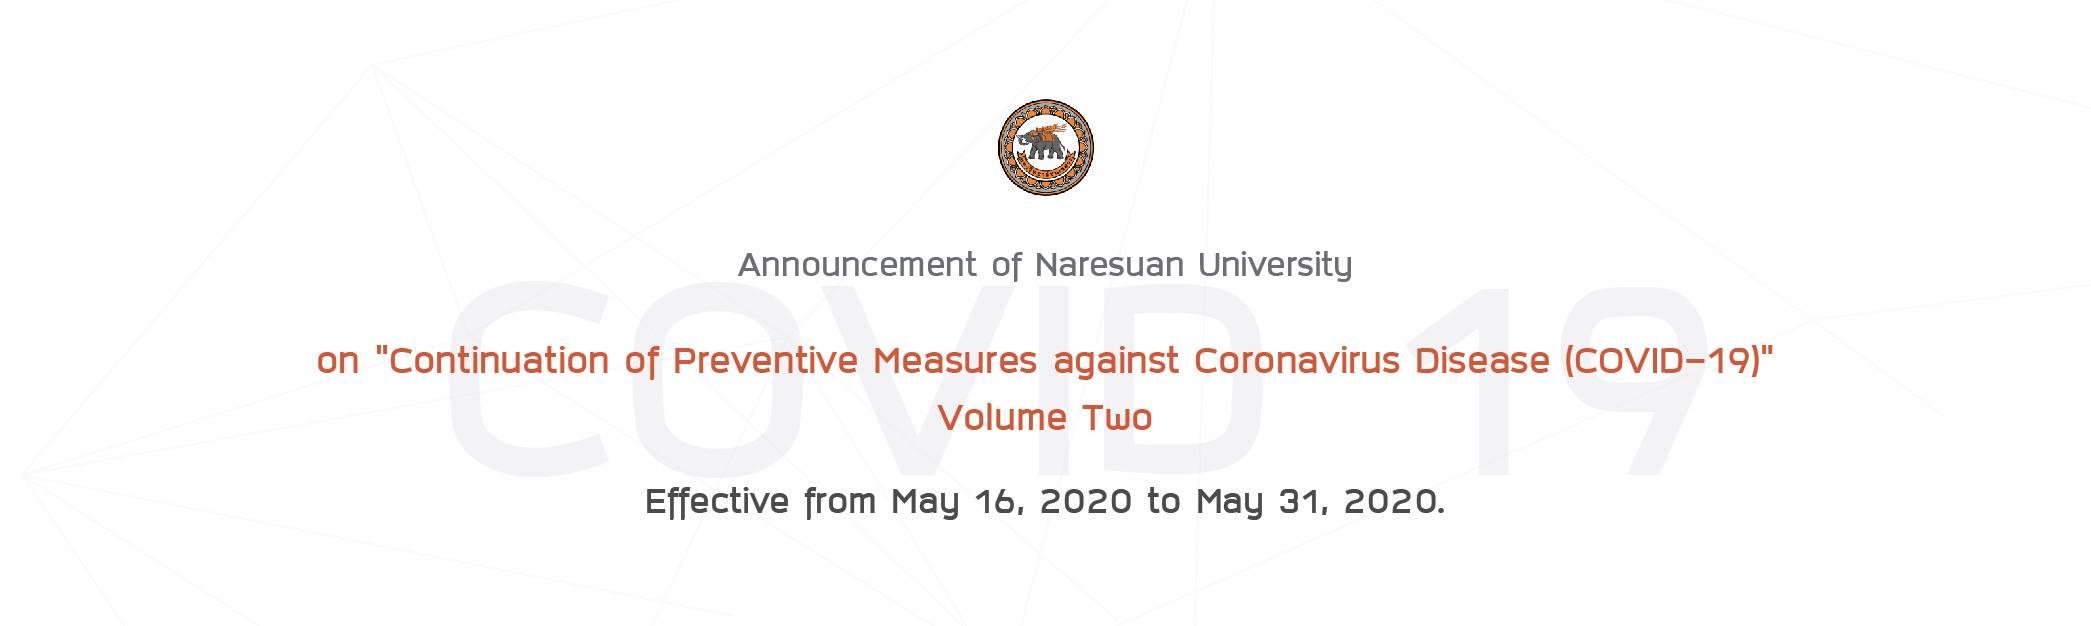 "Announcement of Naresuan University on ""Continuation of Preventive Measures against Coronavirus Disease (COVID-19)"" Volume Two"